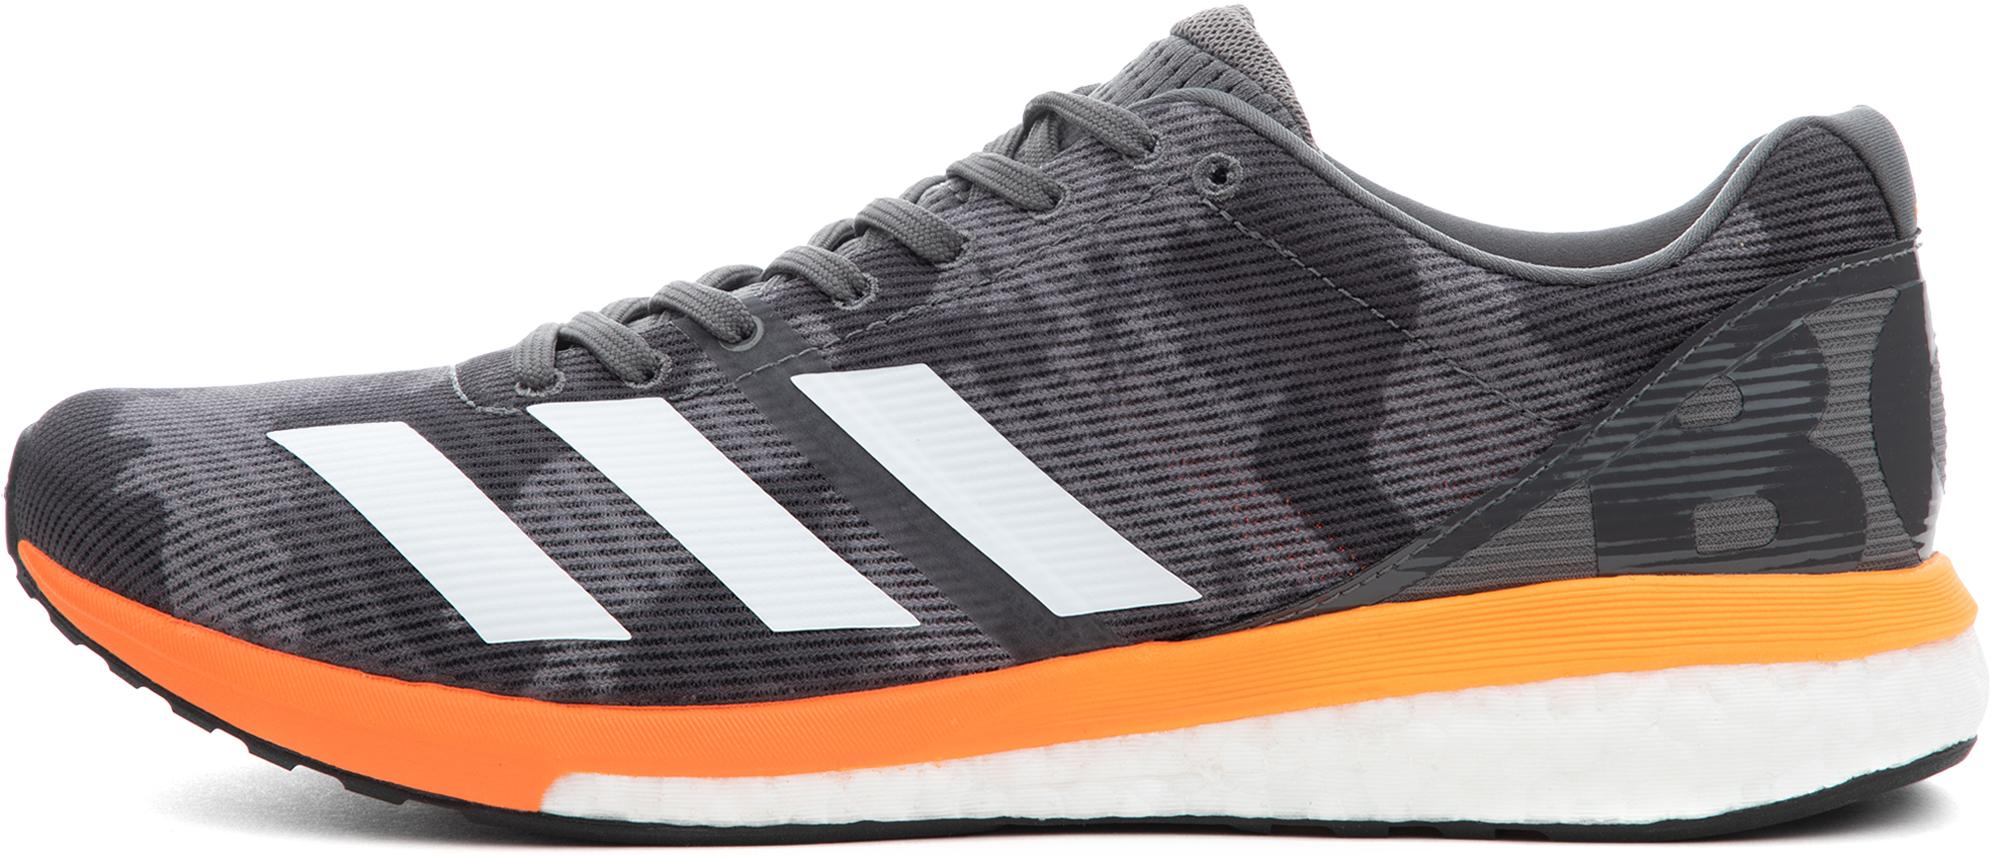 Adidas Кроссовки мужские BOSTON, размер 46